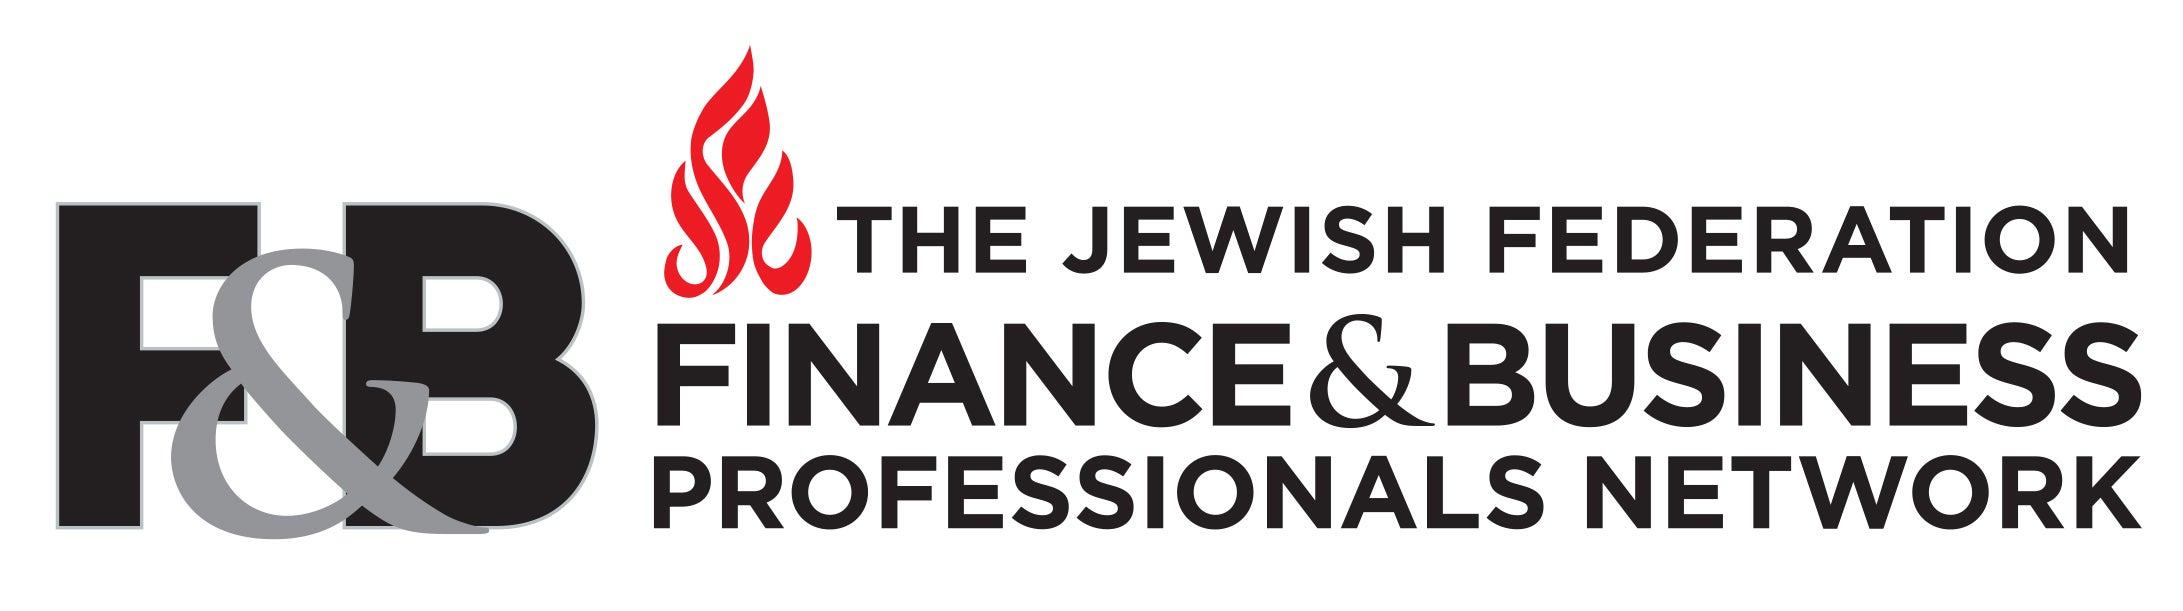 The Jewish Federation Finance & Business Professionals Logo